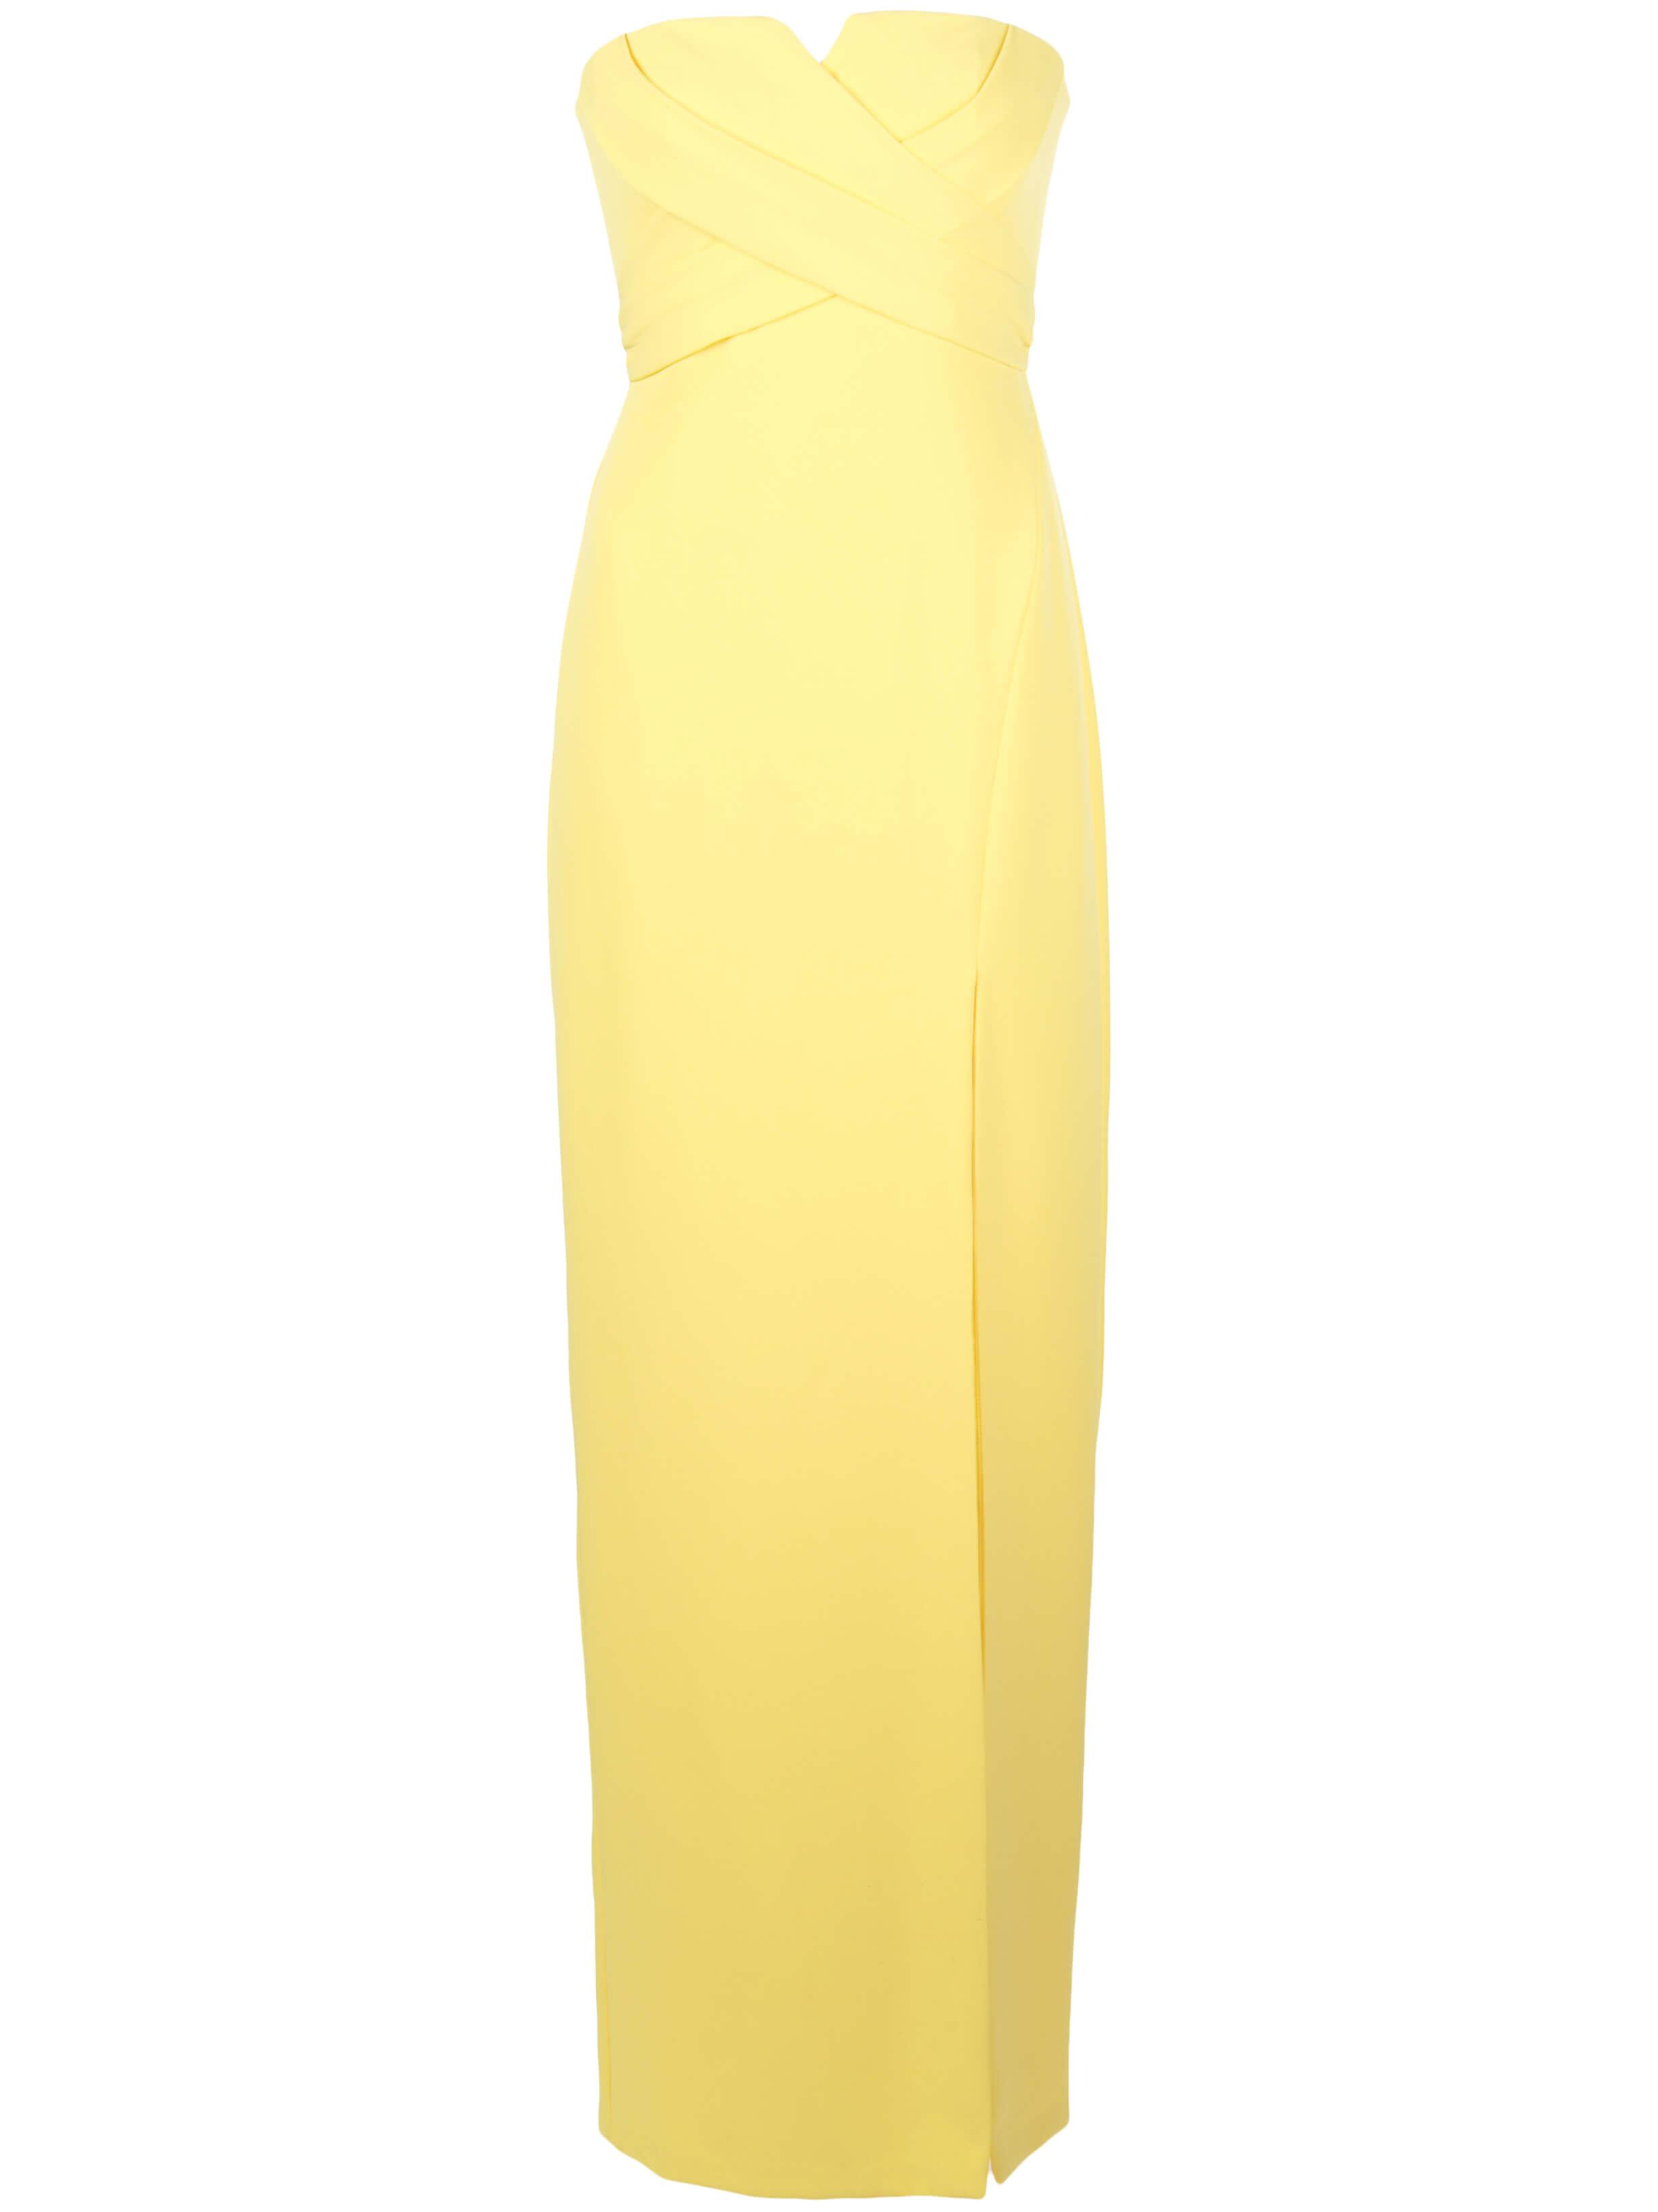 Strapless Crepe Long Dress Item # MN1E203658-S20